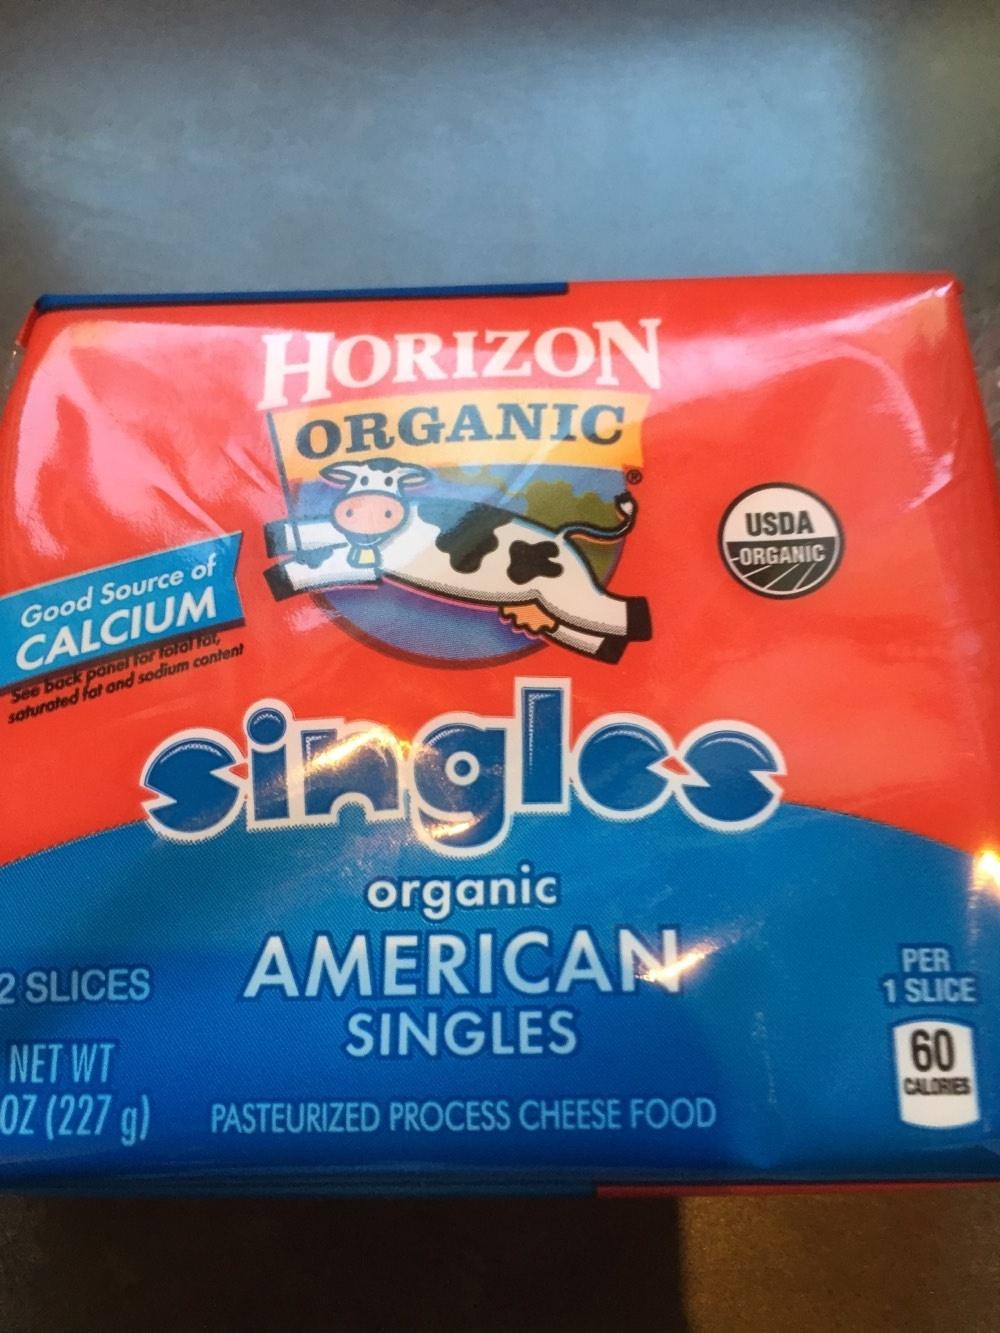 Organic american singles - Product - en